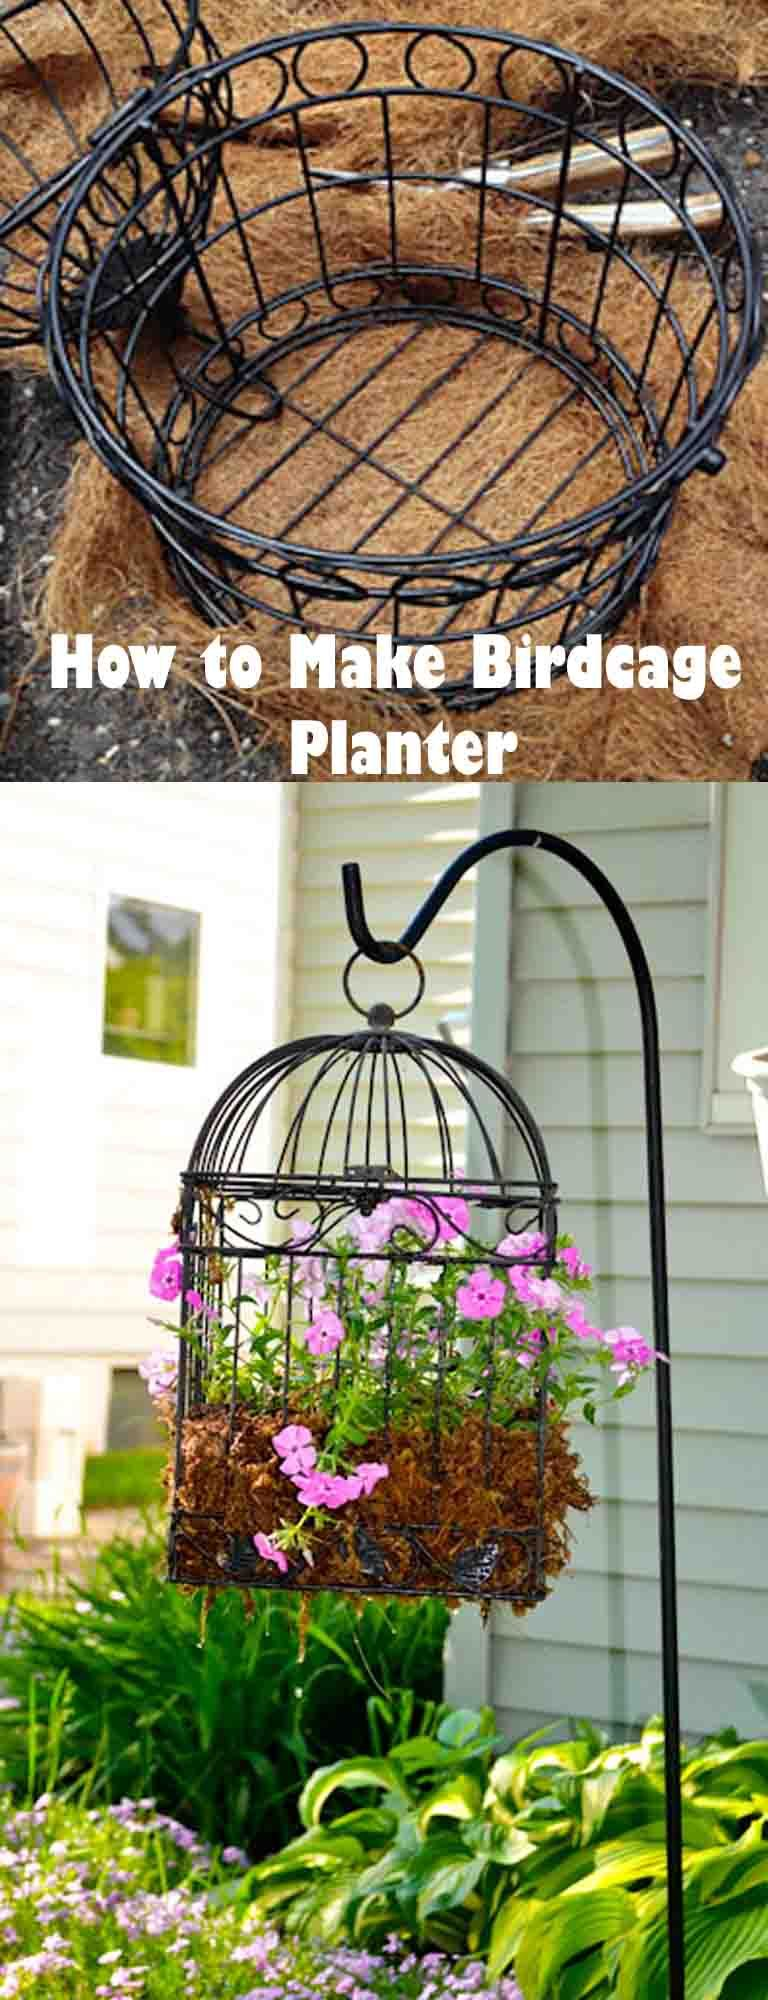 Diy Birdcage Planter Birdcage Planter Planters And Plants 400 x 300